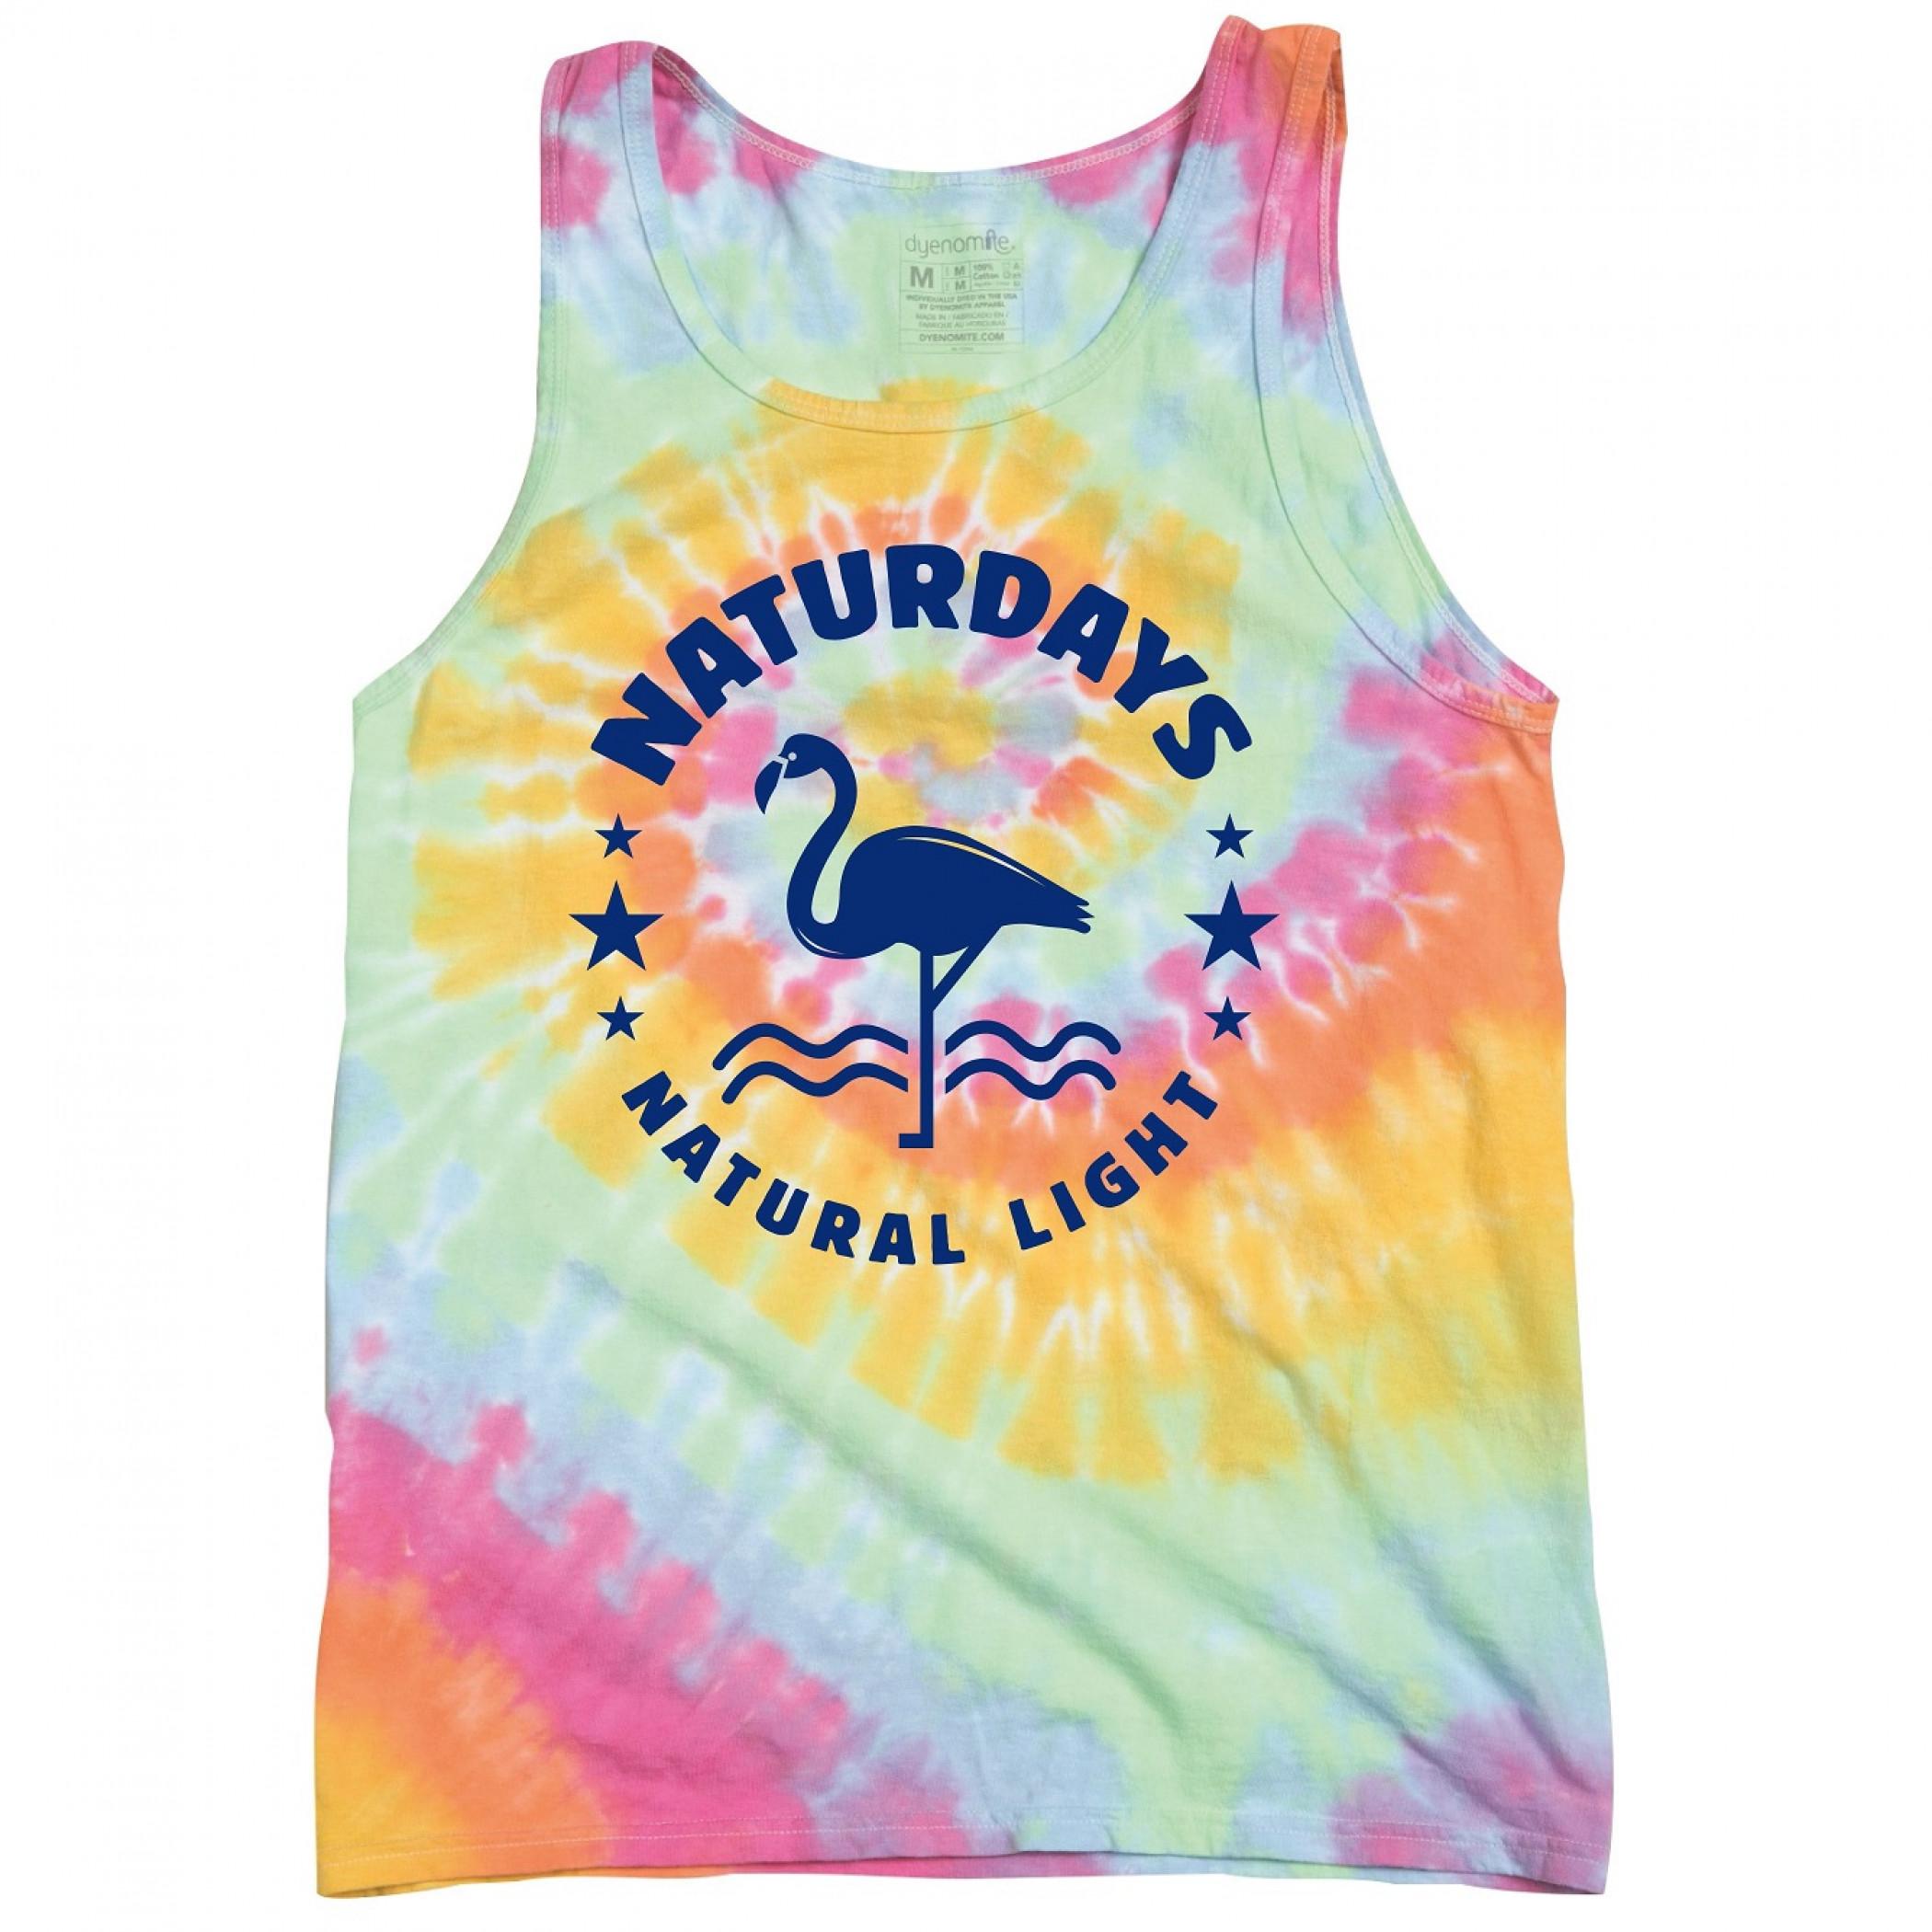 Natural Light Naturdays Tie Dye Tank Top